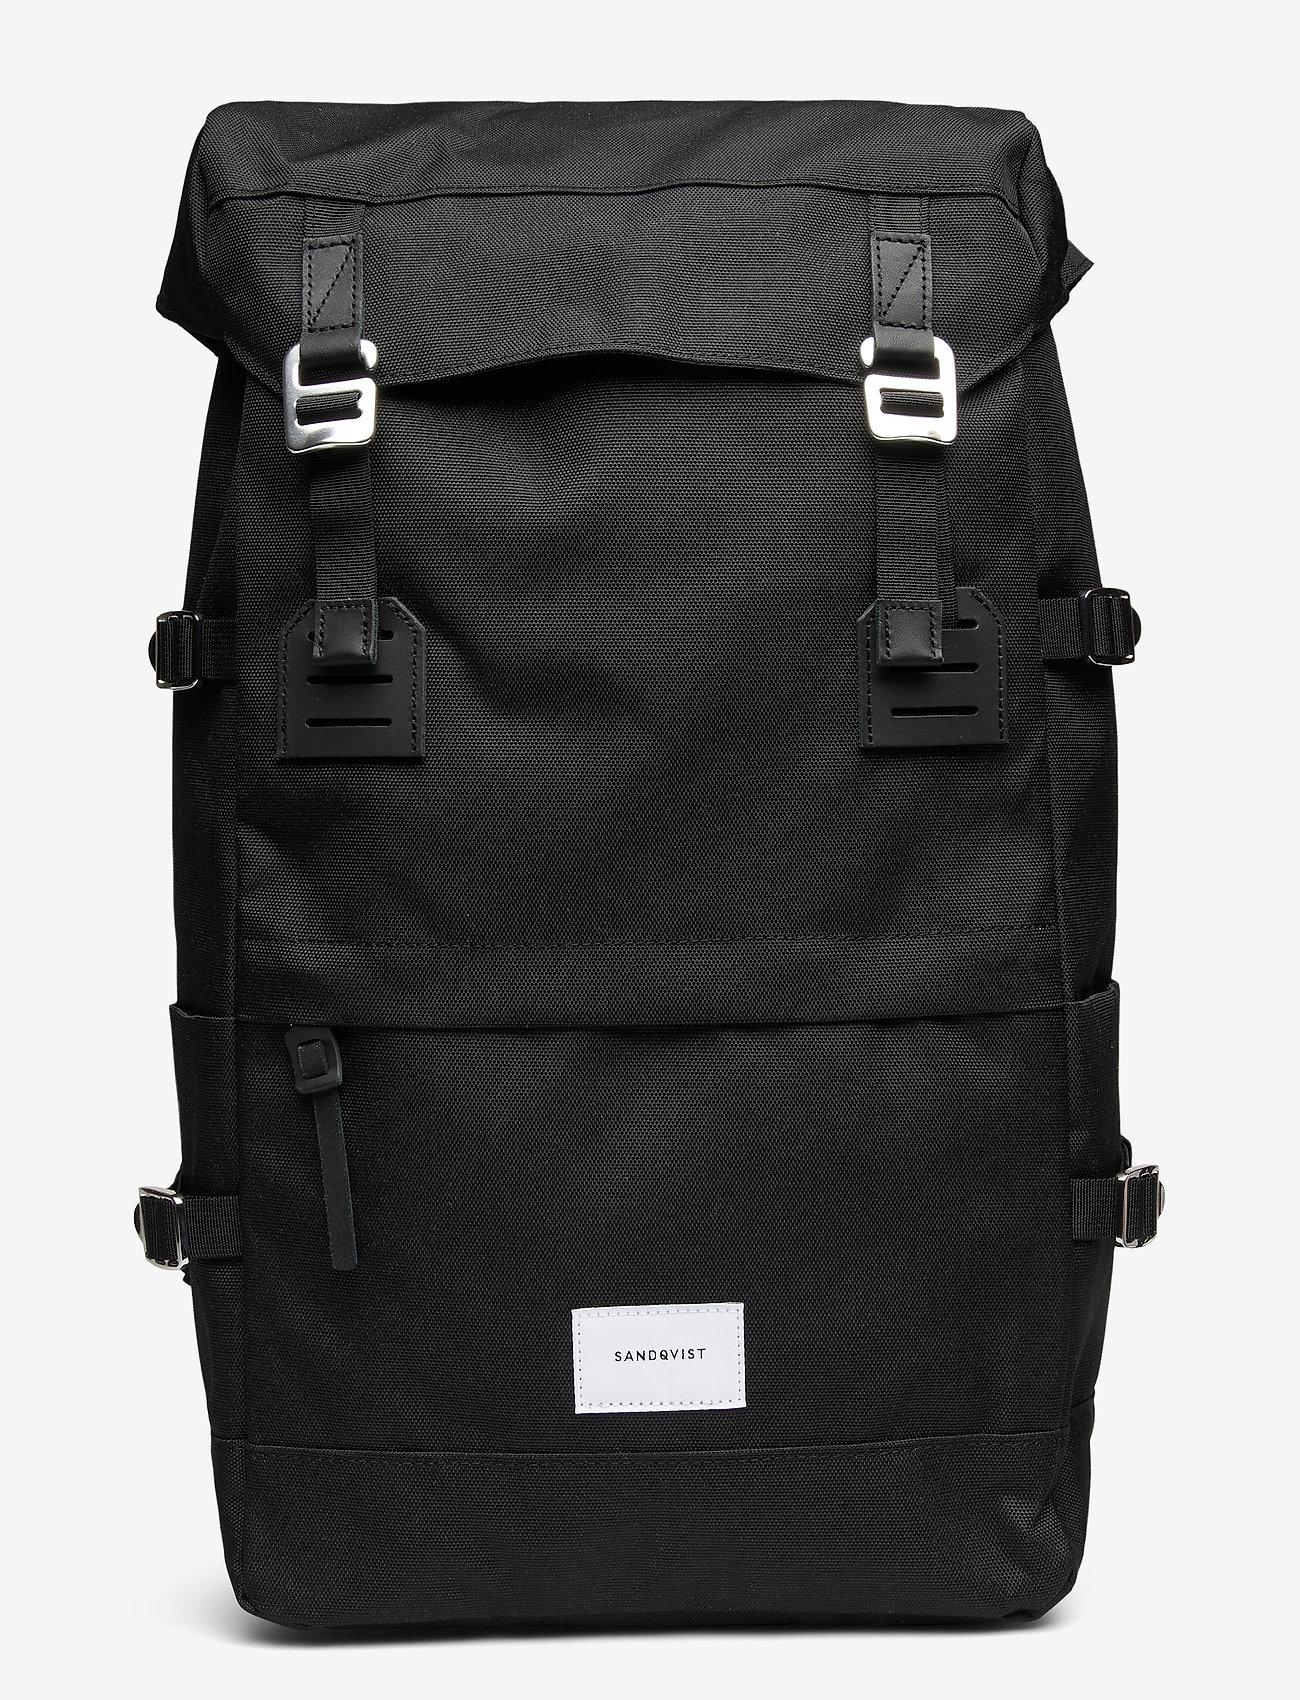 SANDQVIST - HARALD - nieuwe mode - black - 1